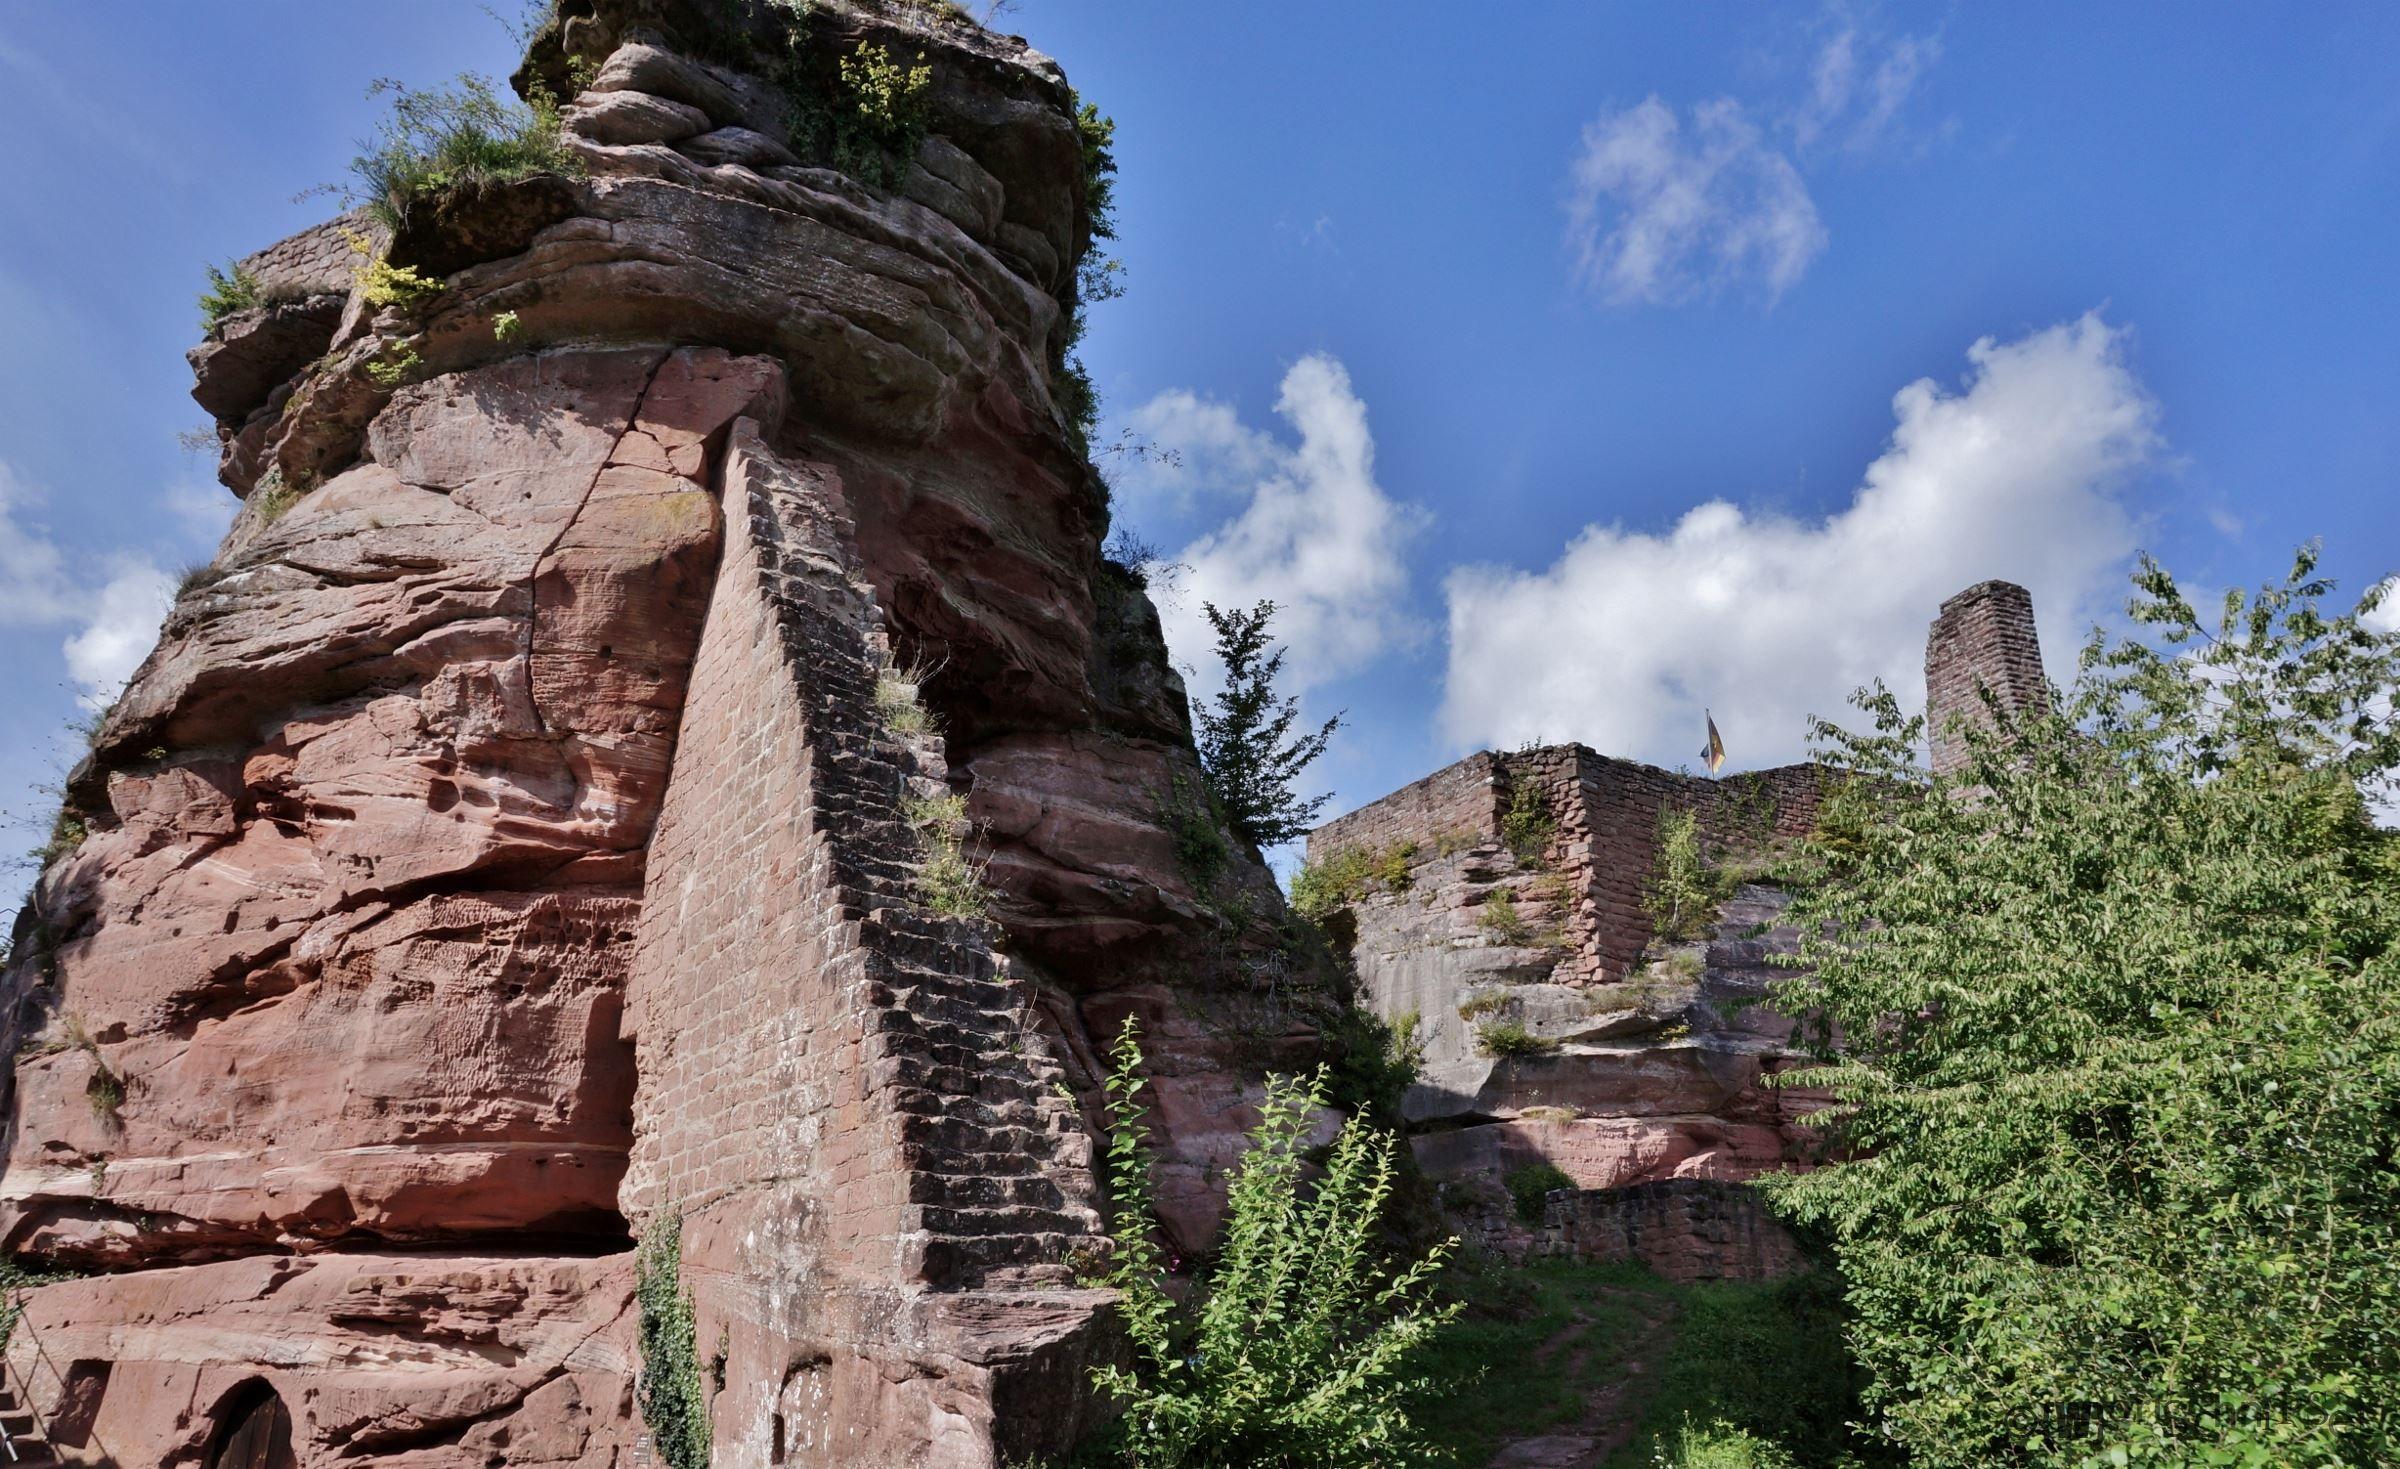 Dahner Burgengruppe. Castles of Dahn. Schöne orte, Die